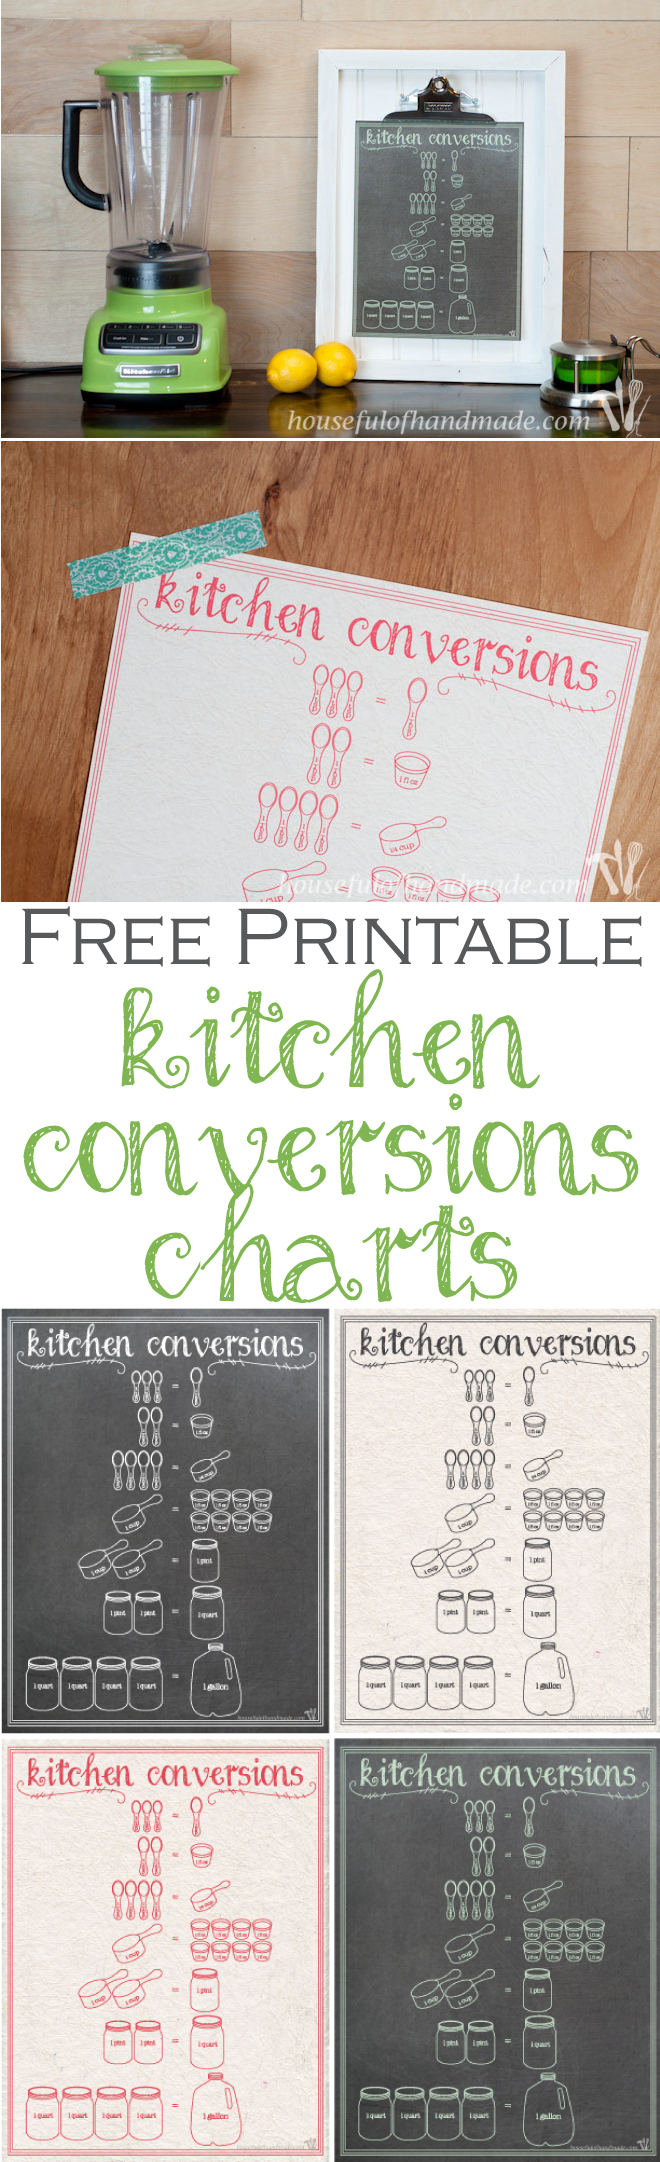 Free printable kitchen conversion chart kitchen conversion chart free printable kitchen conversion chart a houseful of handmade nvjuhfo Choice Image